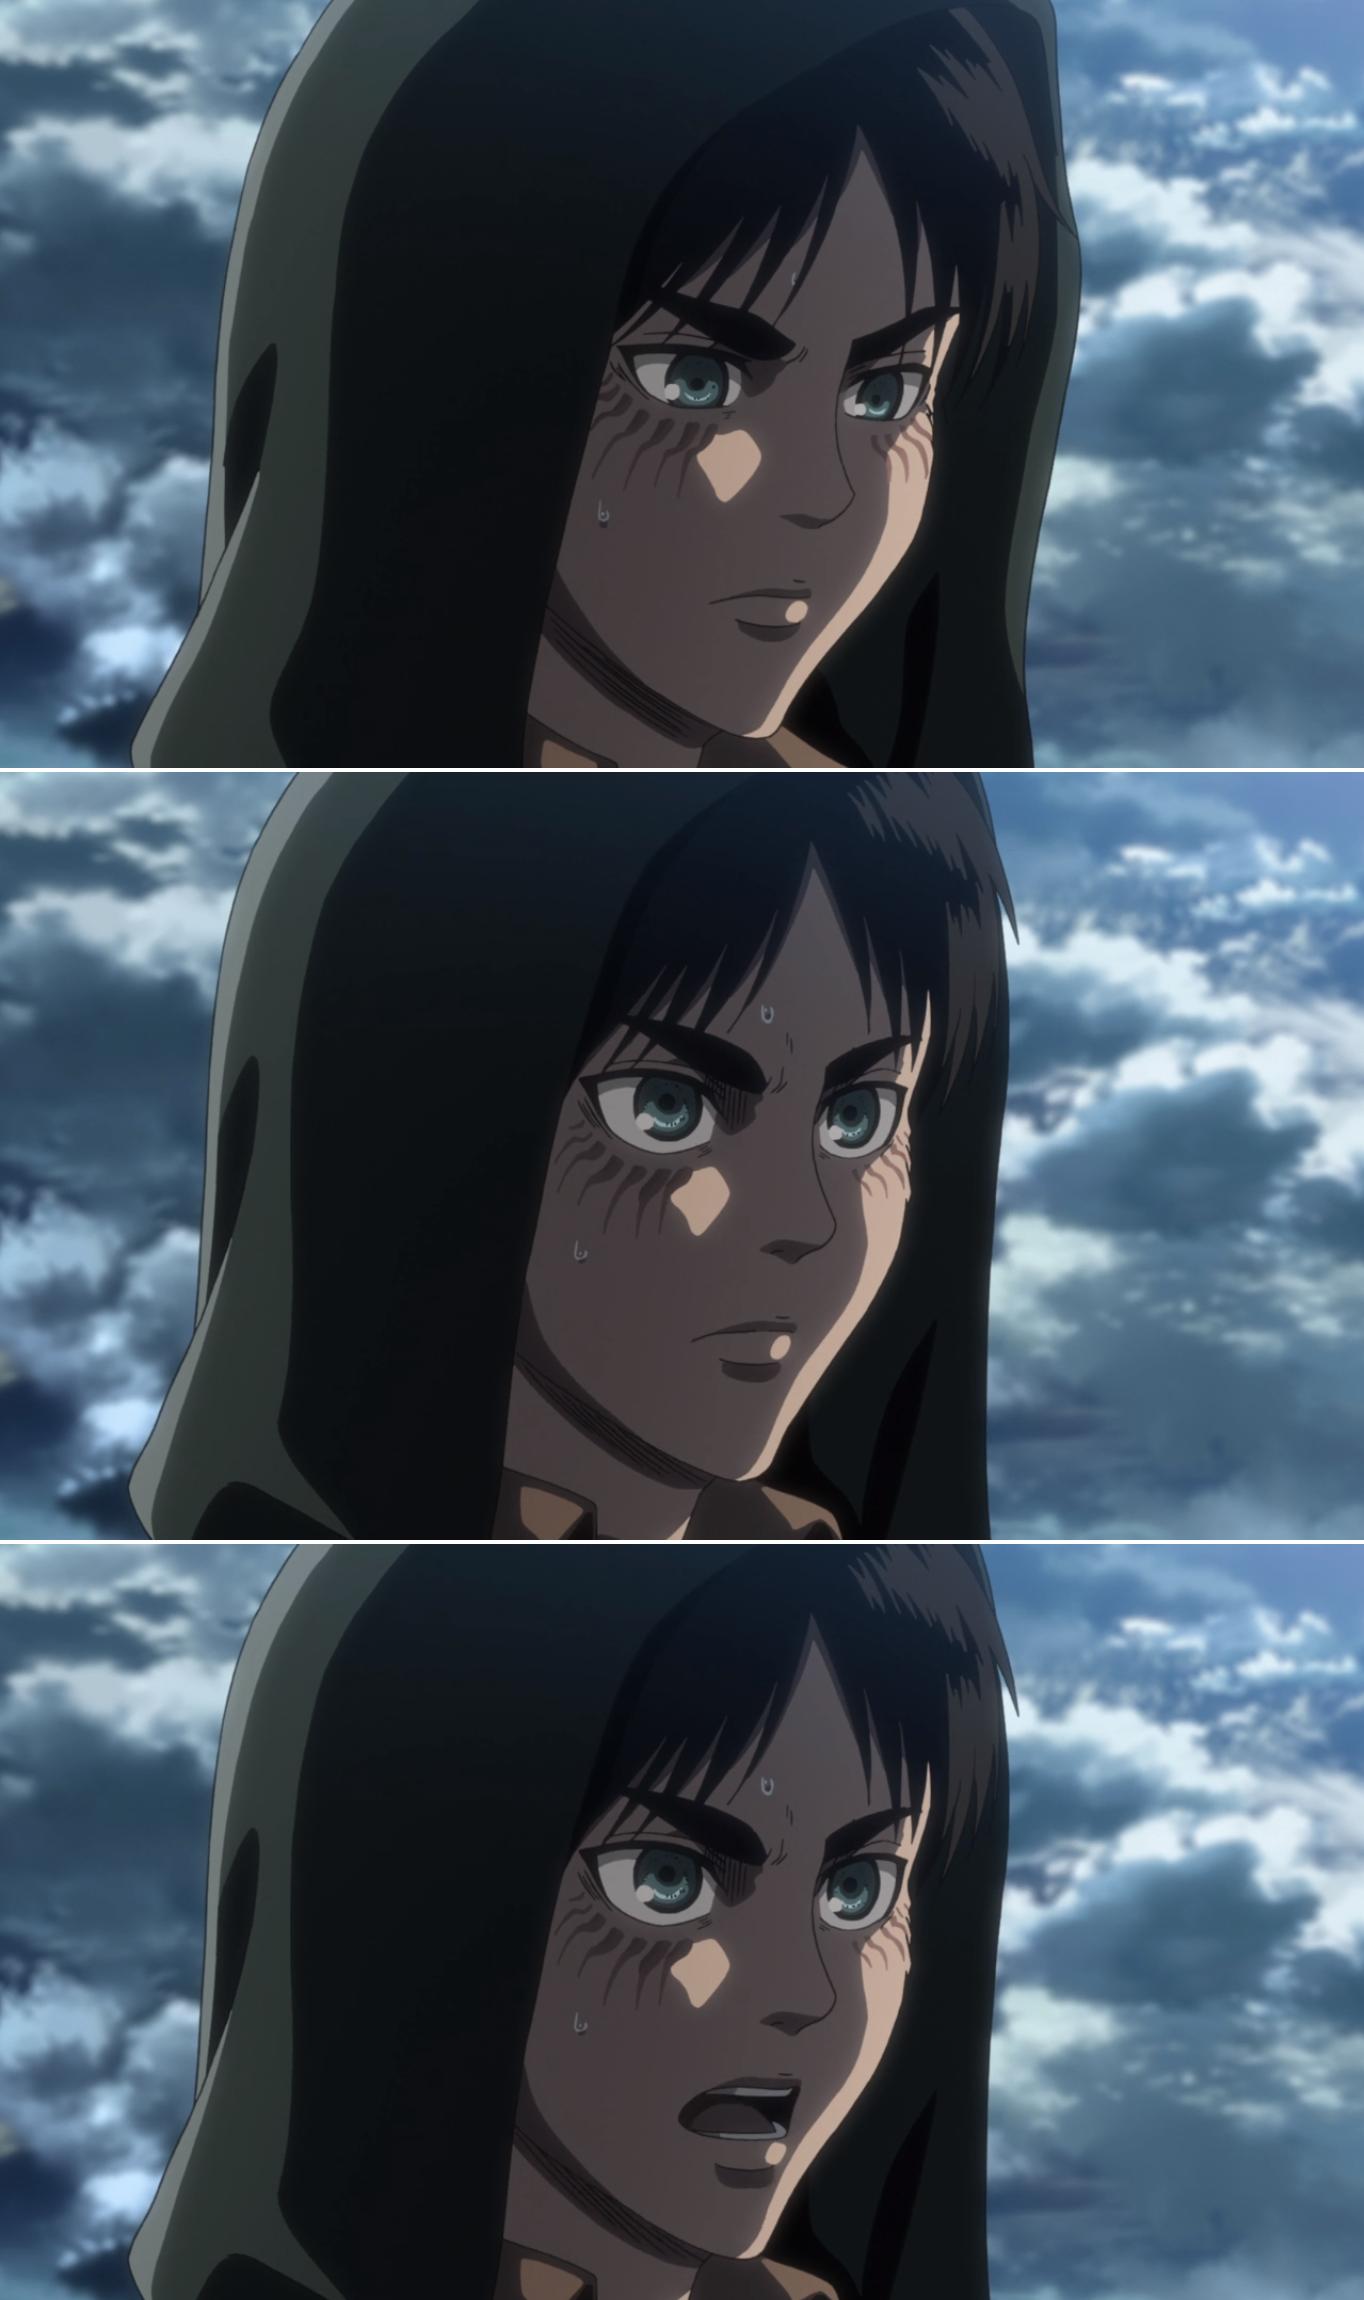 Eren SnK season 3 part 2 Attack on titan, Anime